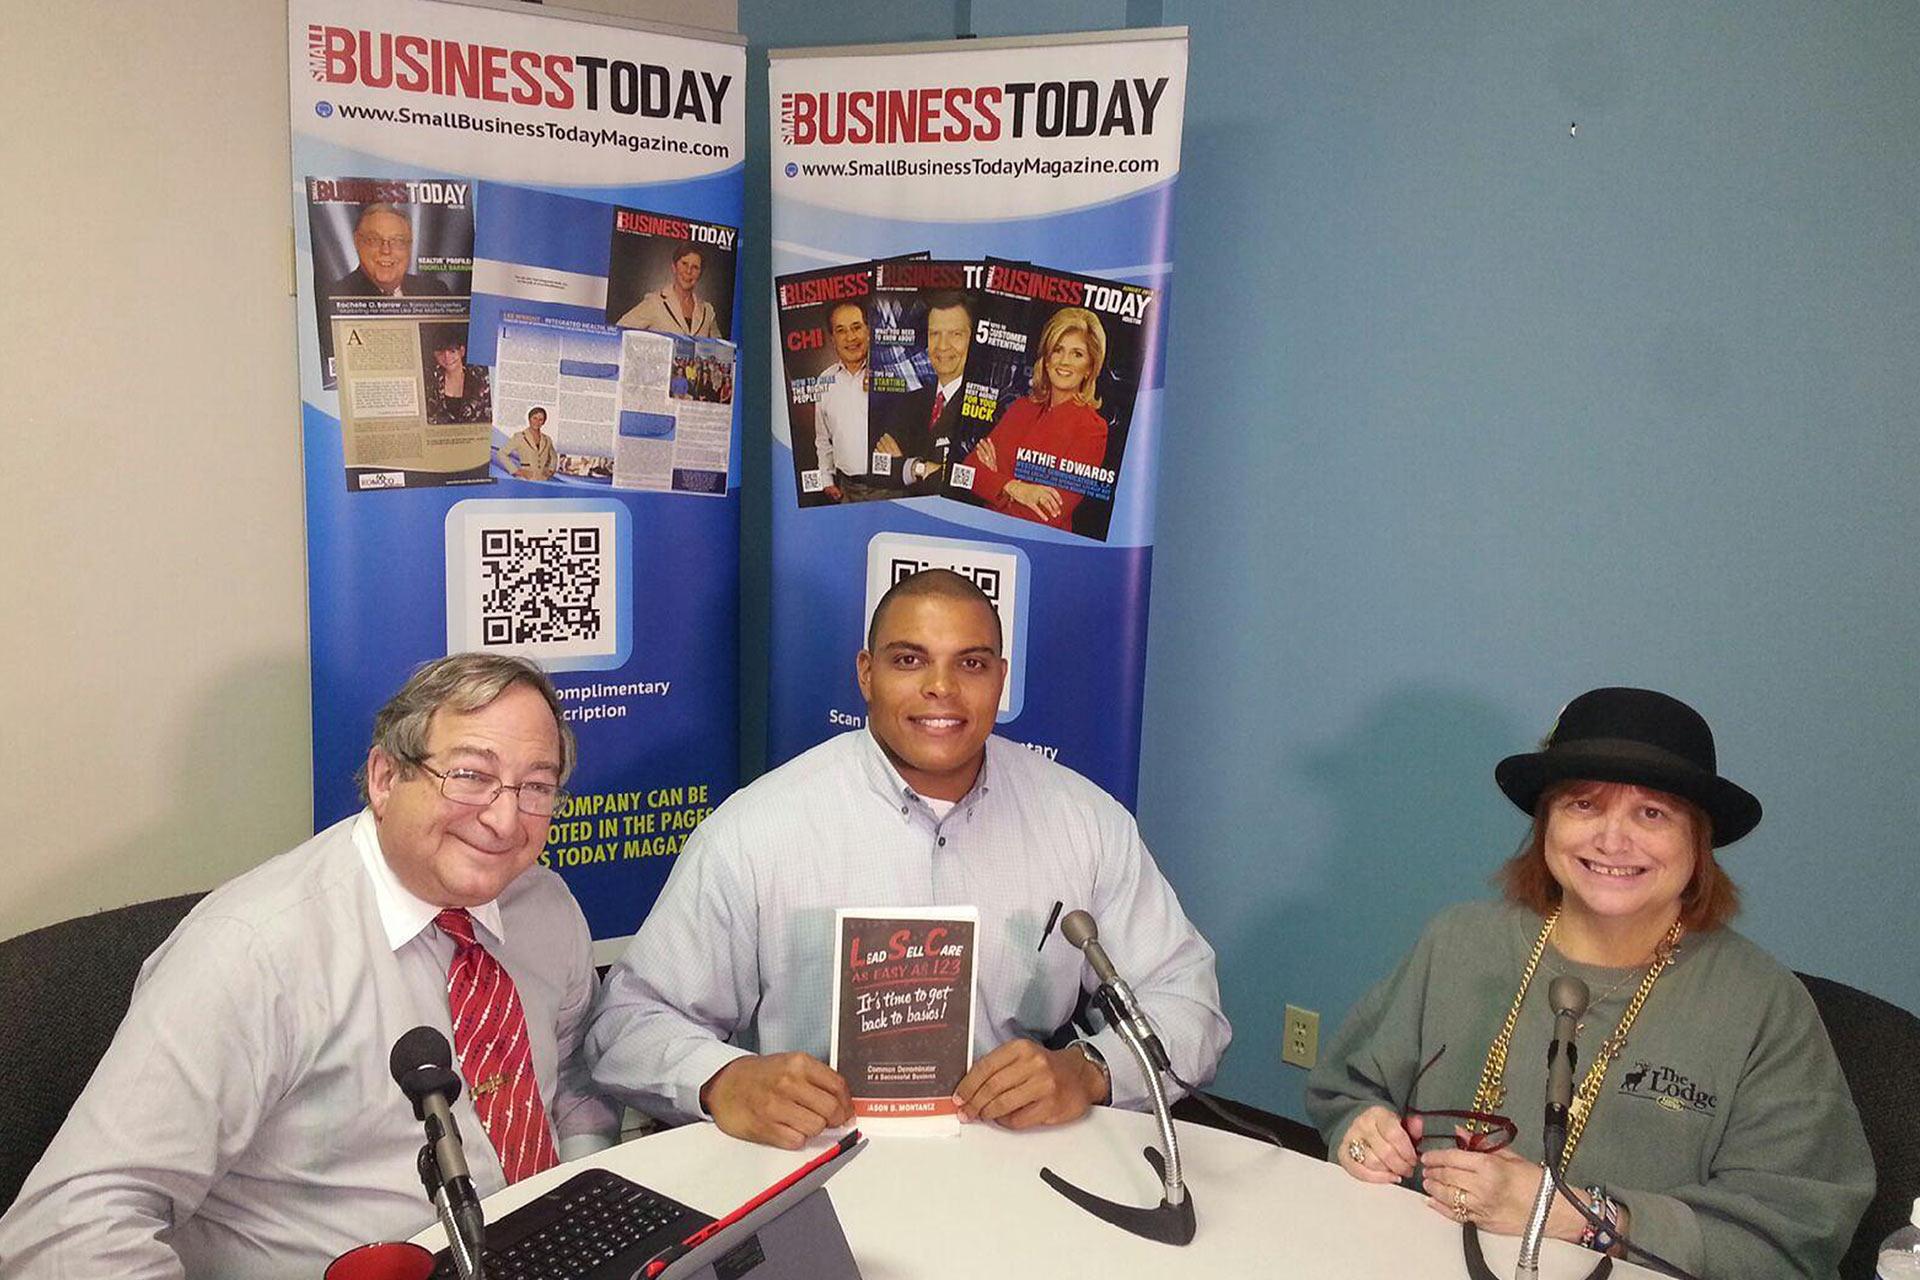 Jason Montanez Small Business Today 2